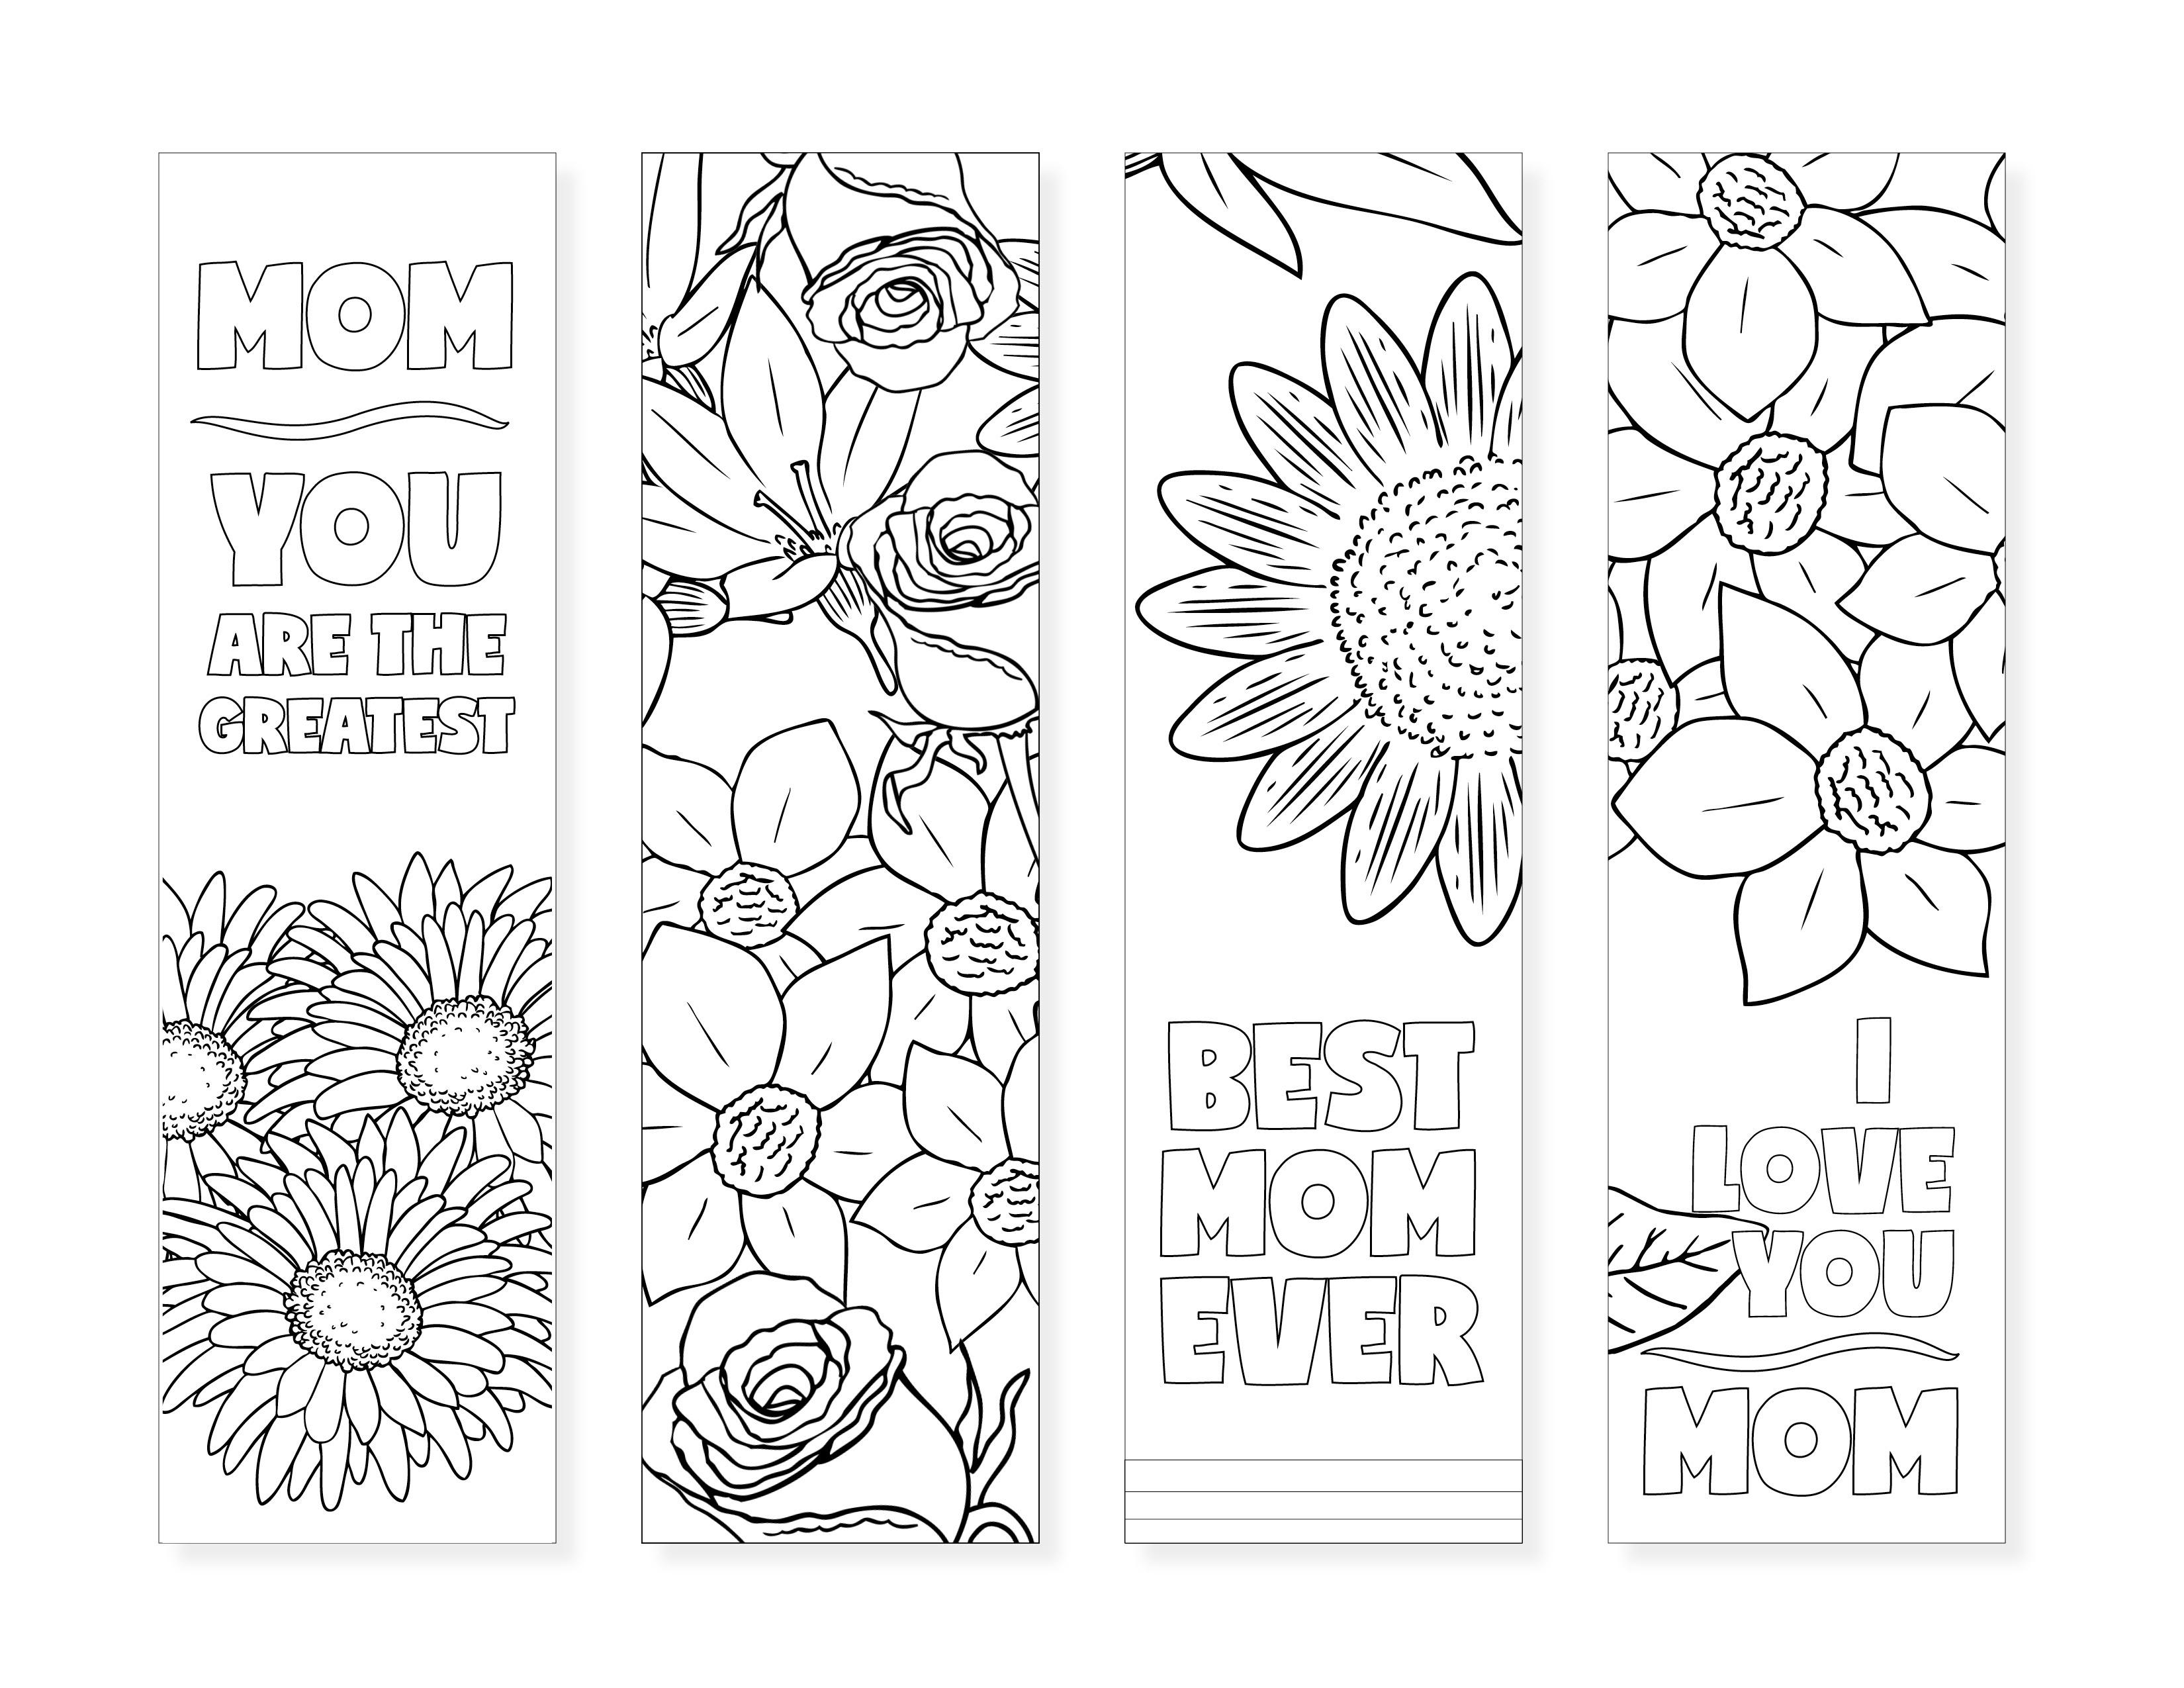 Free Printable Bookmarks For Moms - Design Dazzle - Free Printable Book Marks